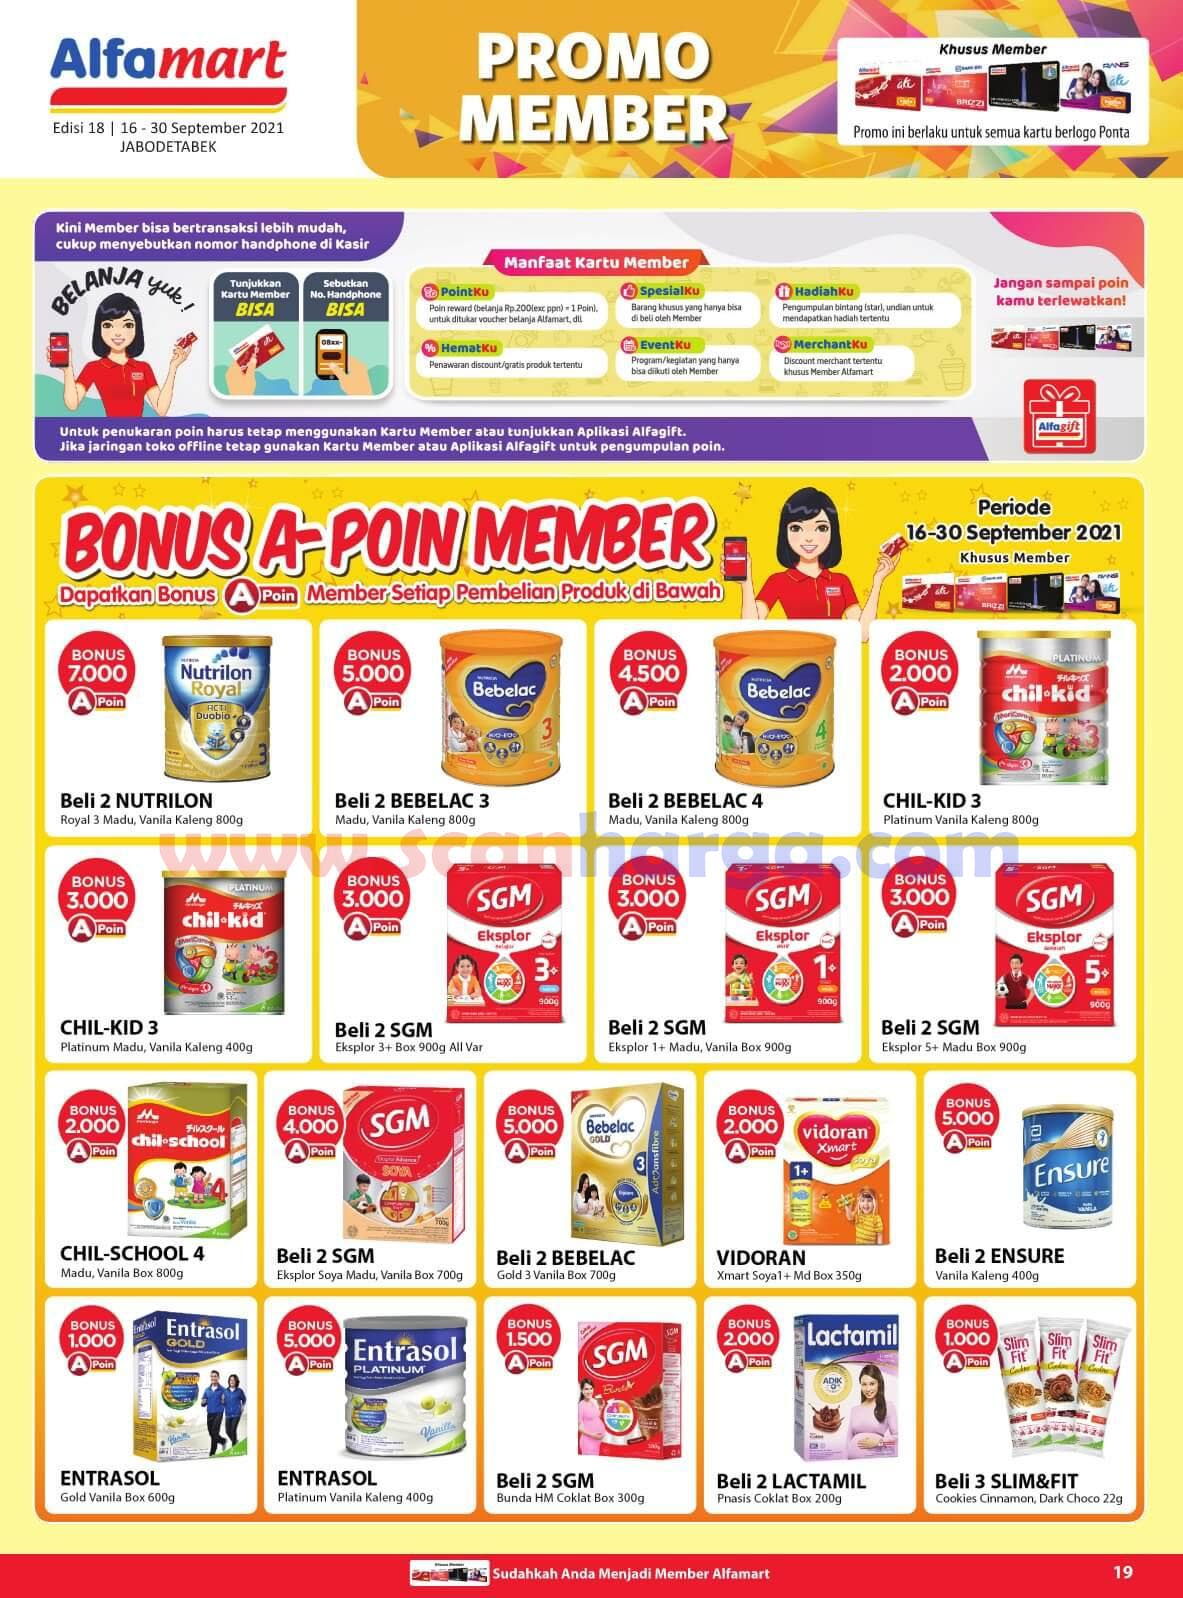 Katalog Promo Alfamart 16 - 30 September 2021 19